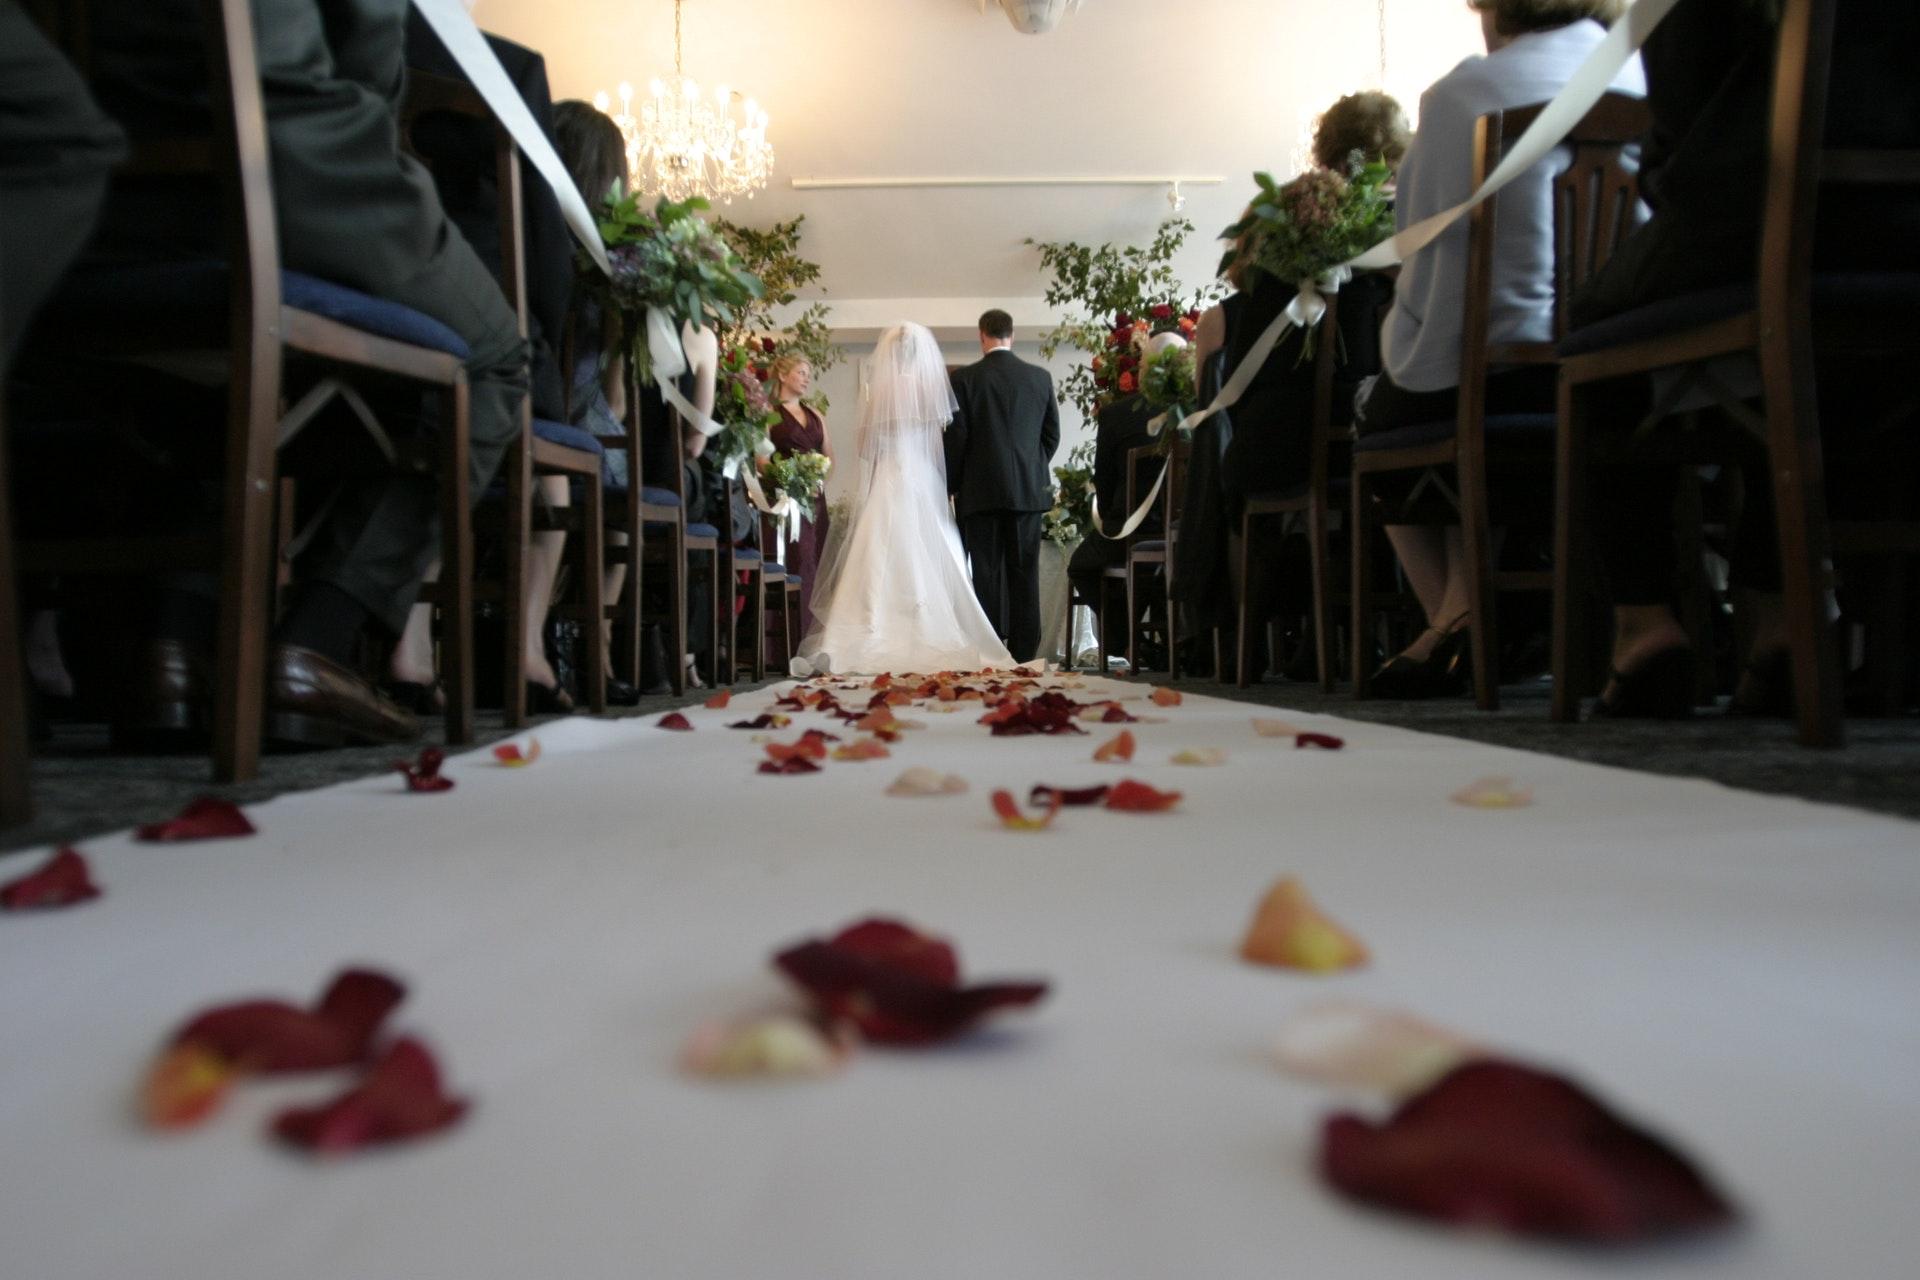 eccaa4238c93 Νομικές Διαδικασίες Γάμου – Aspara